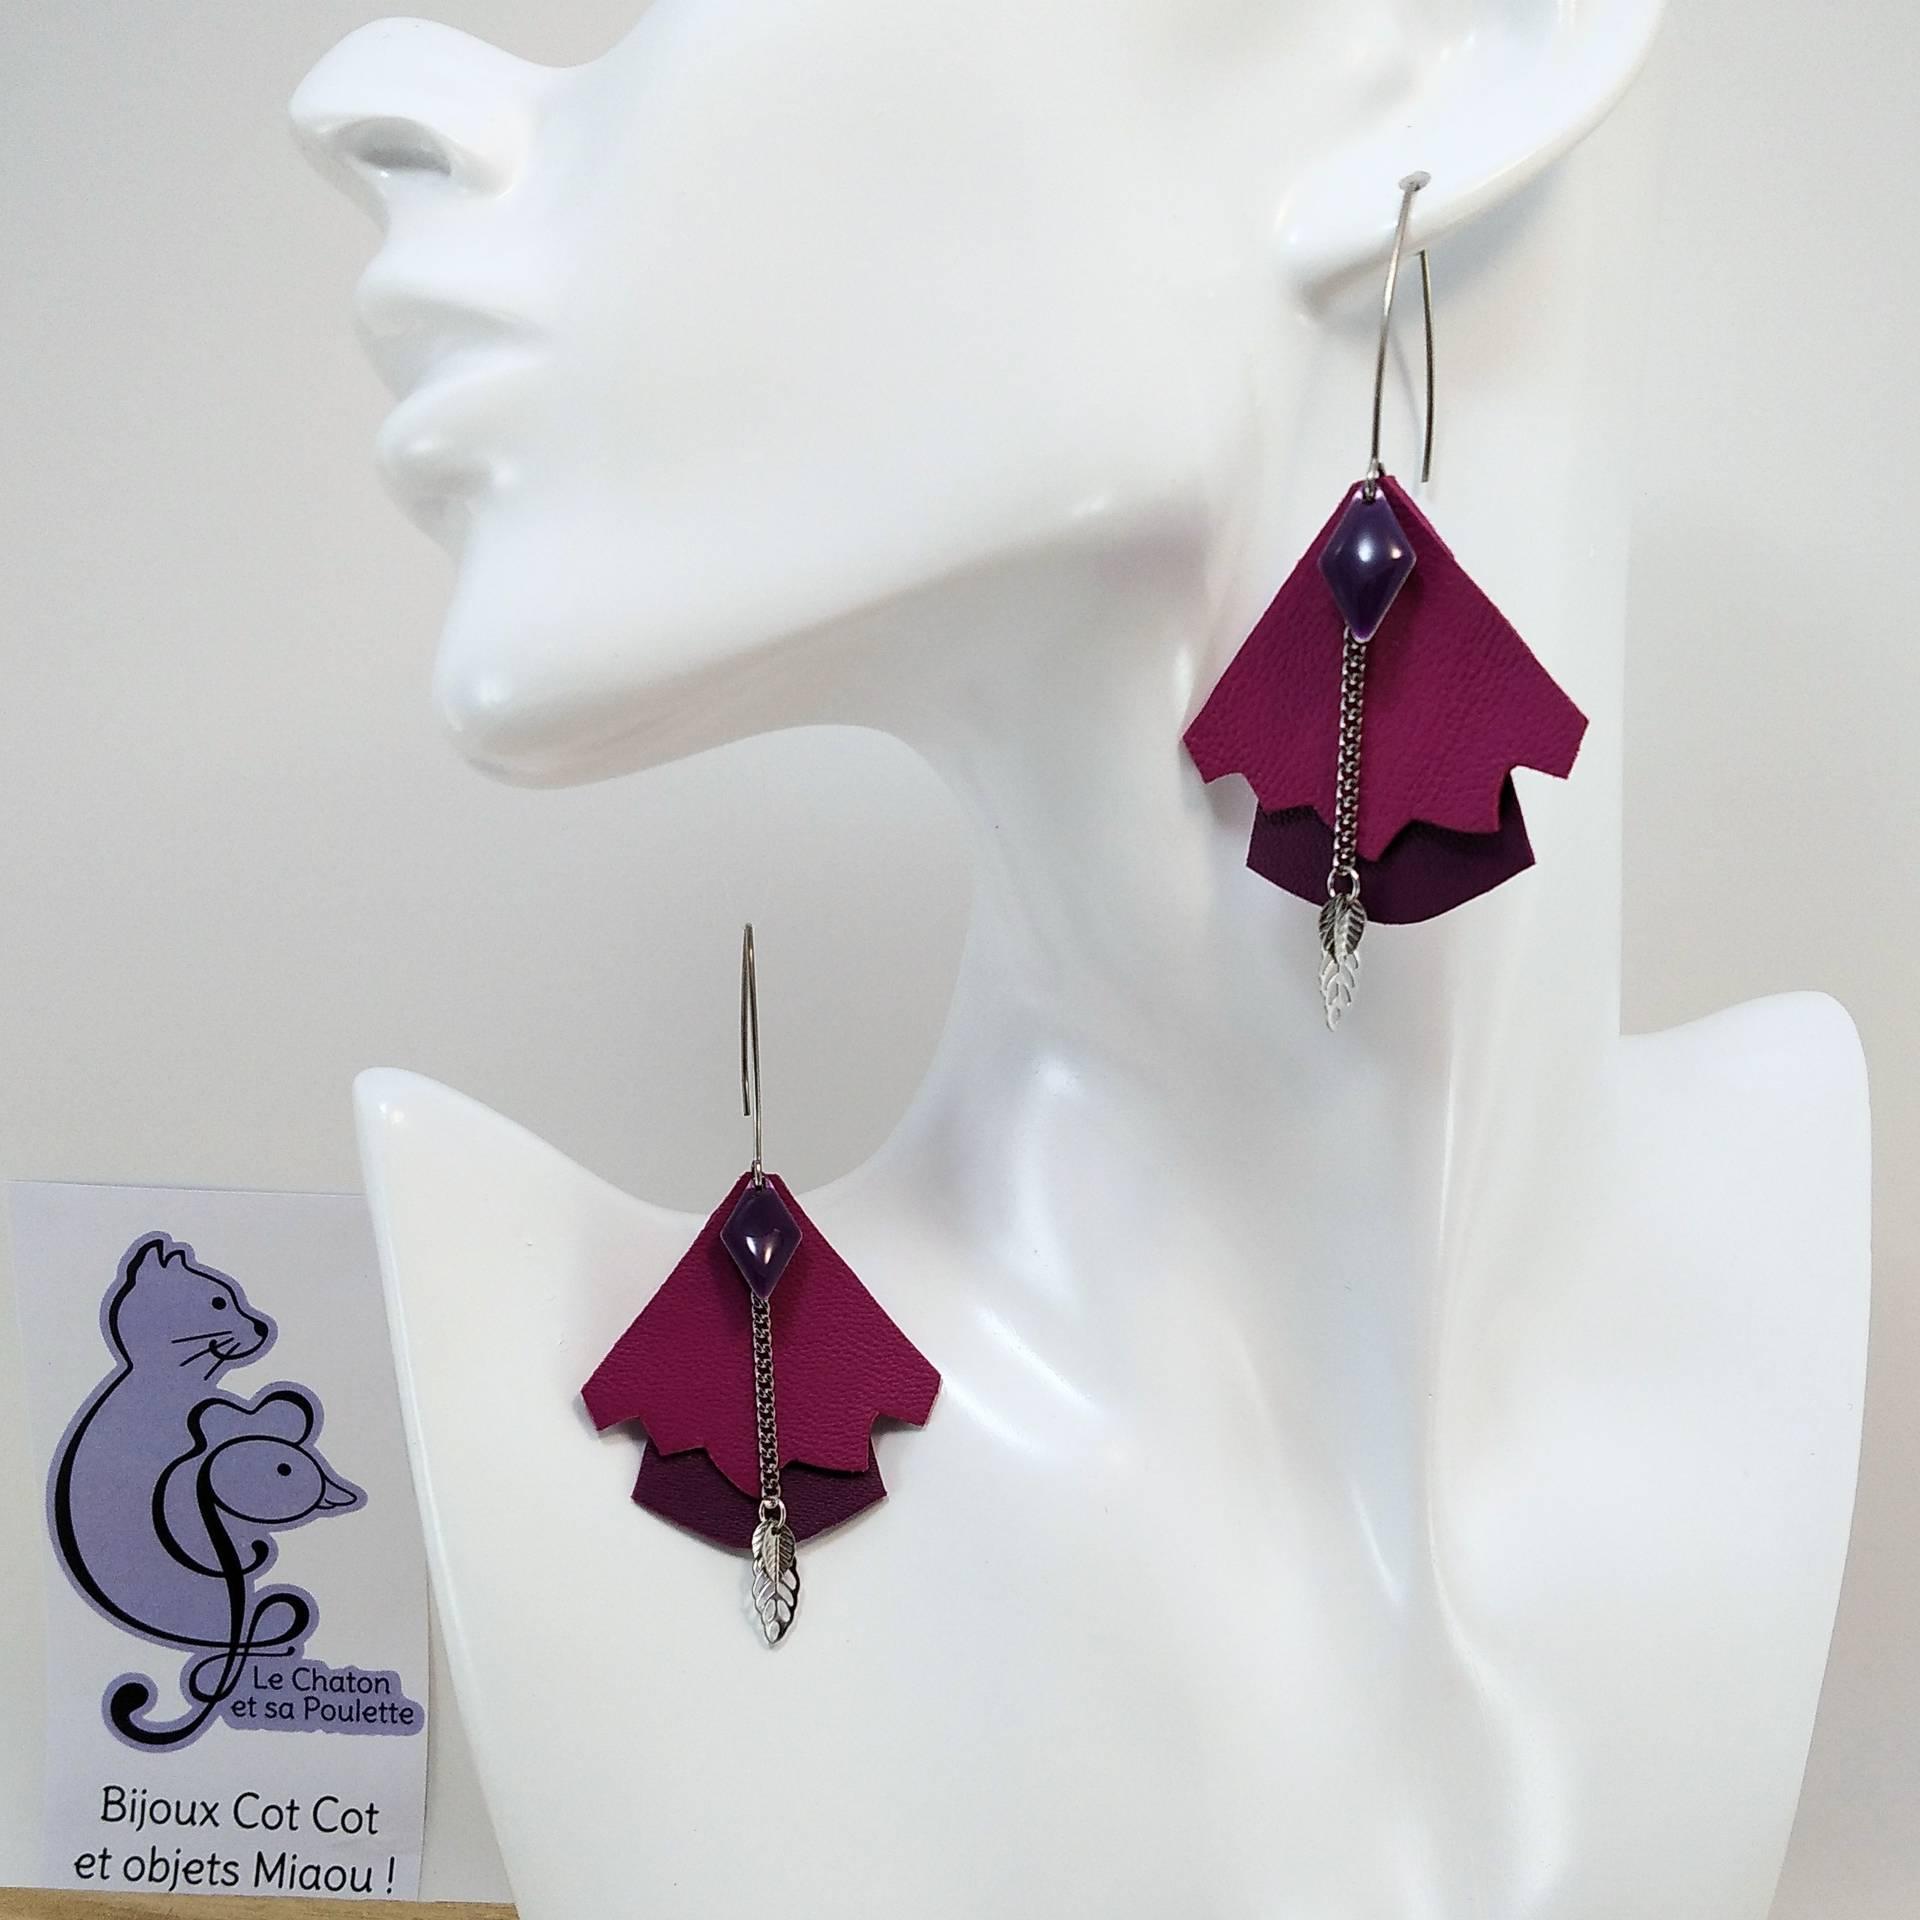 BO FORMIDABLE modèle n°5 Cuirs fuchsia et prune, breloque diamant prune